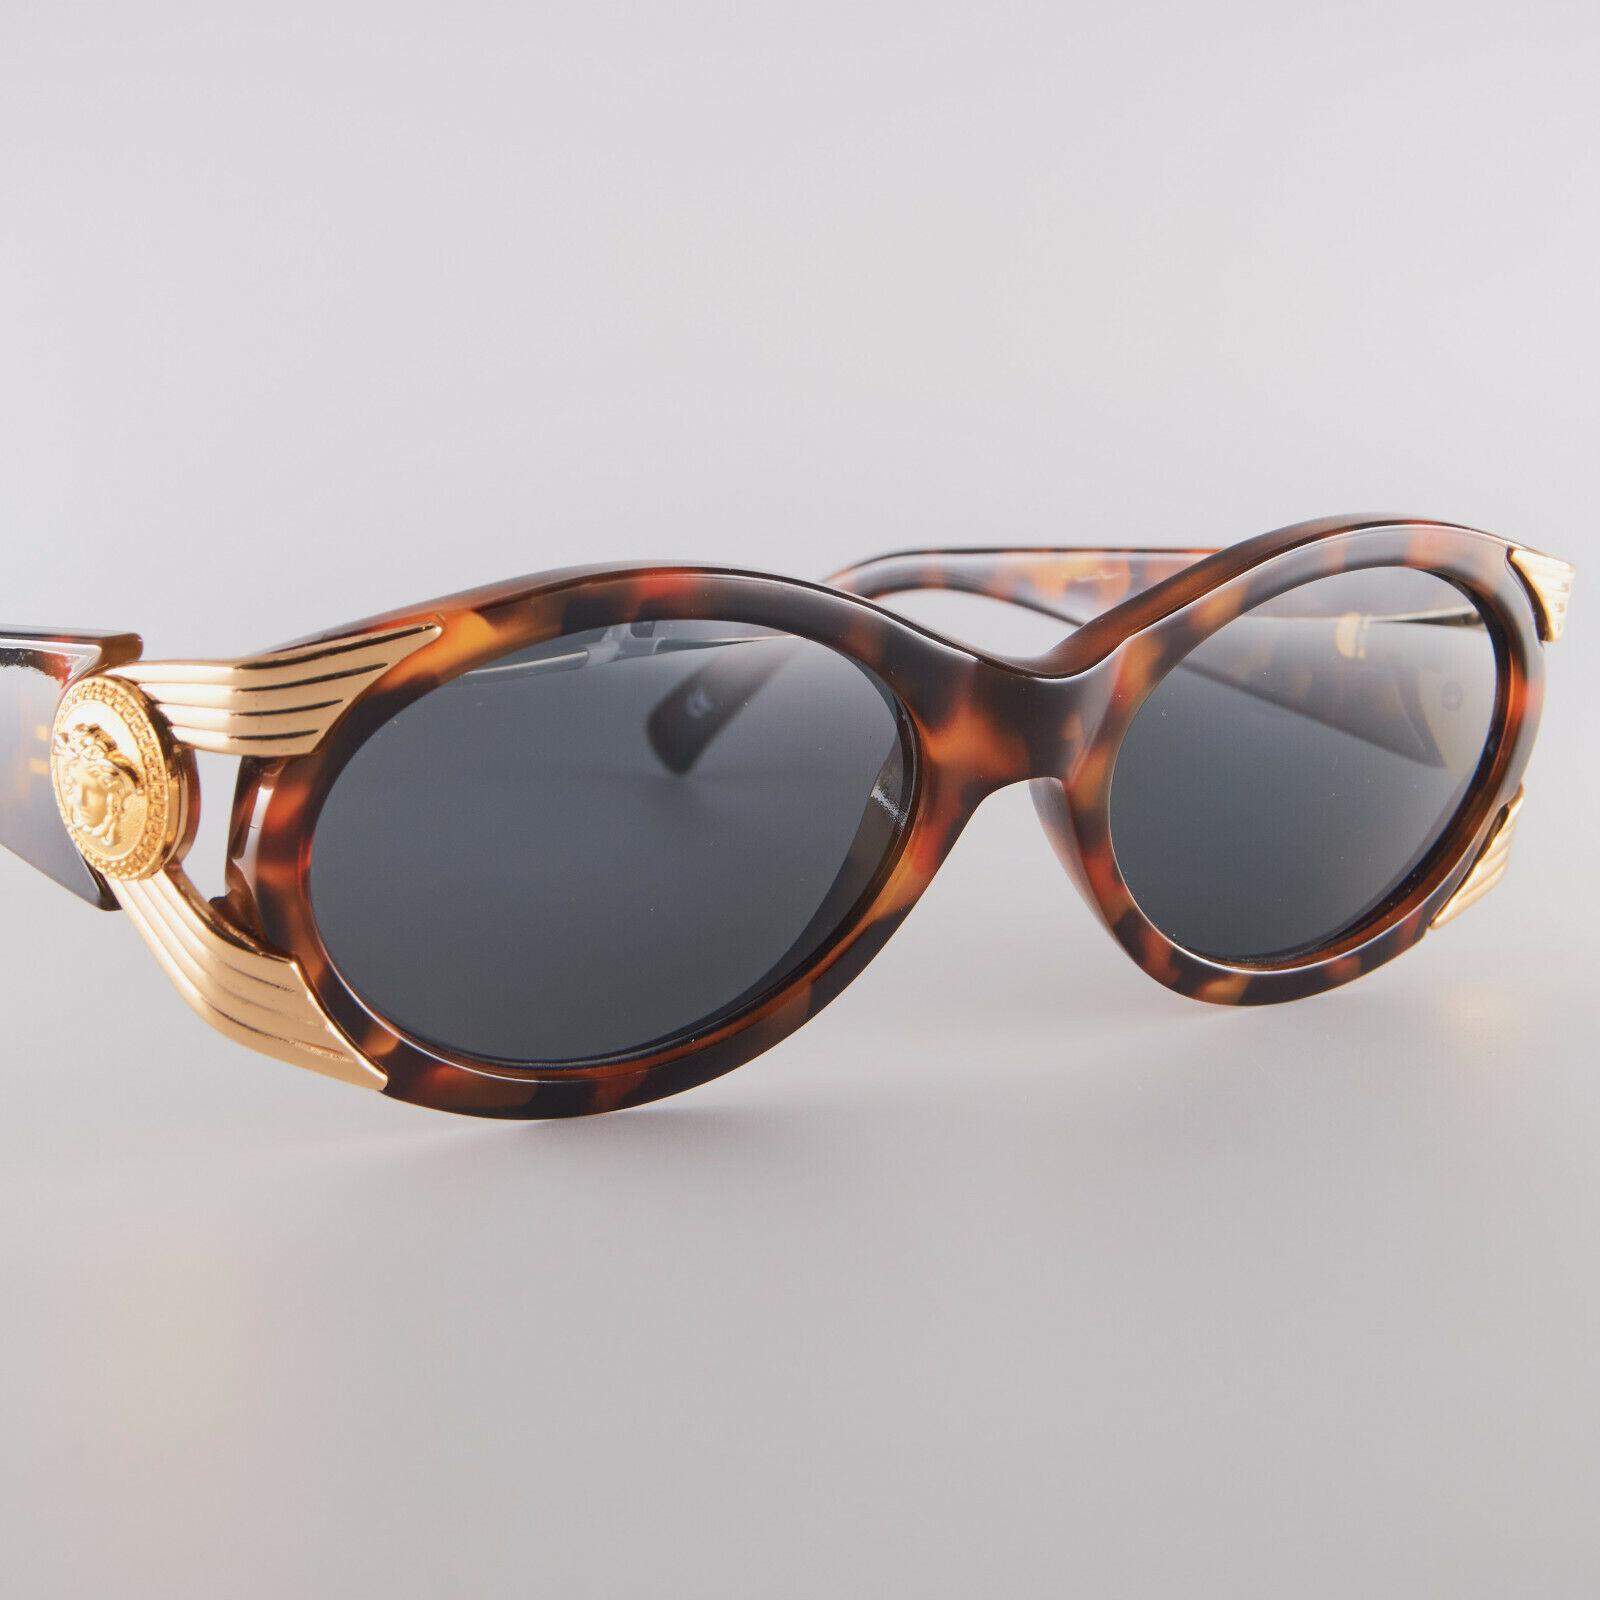 GIANNI VERSACE v12 030 47 20 vintage sunglasses DEADSTOCK